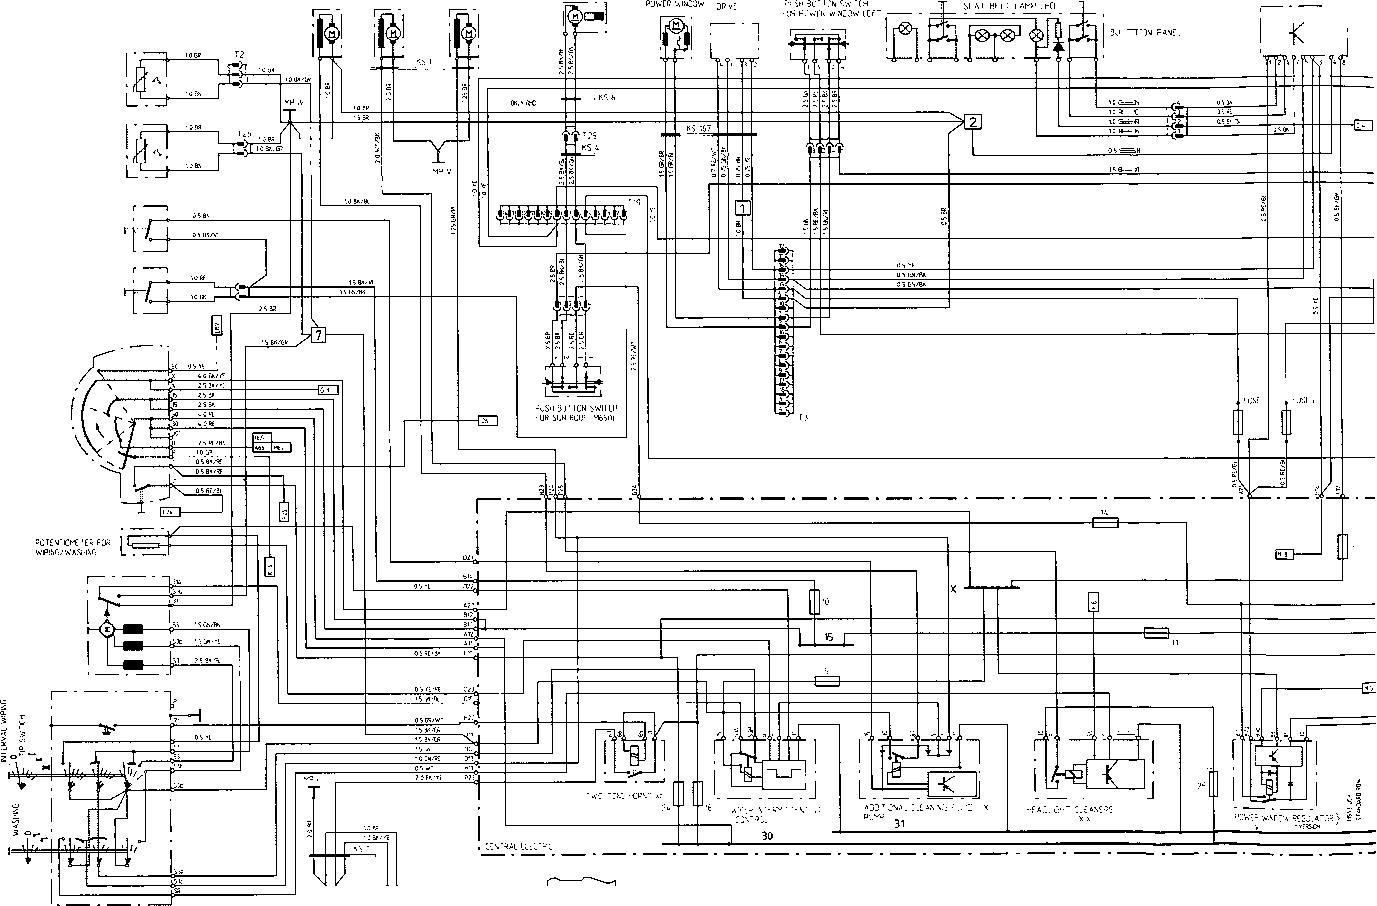 porsche 924 turbo wiring diagram explained wiring diagrams porsche 924  carrera gt 1980 porsche 928 wiring